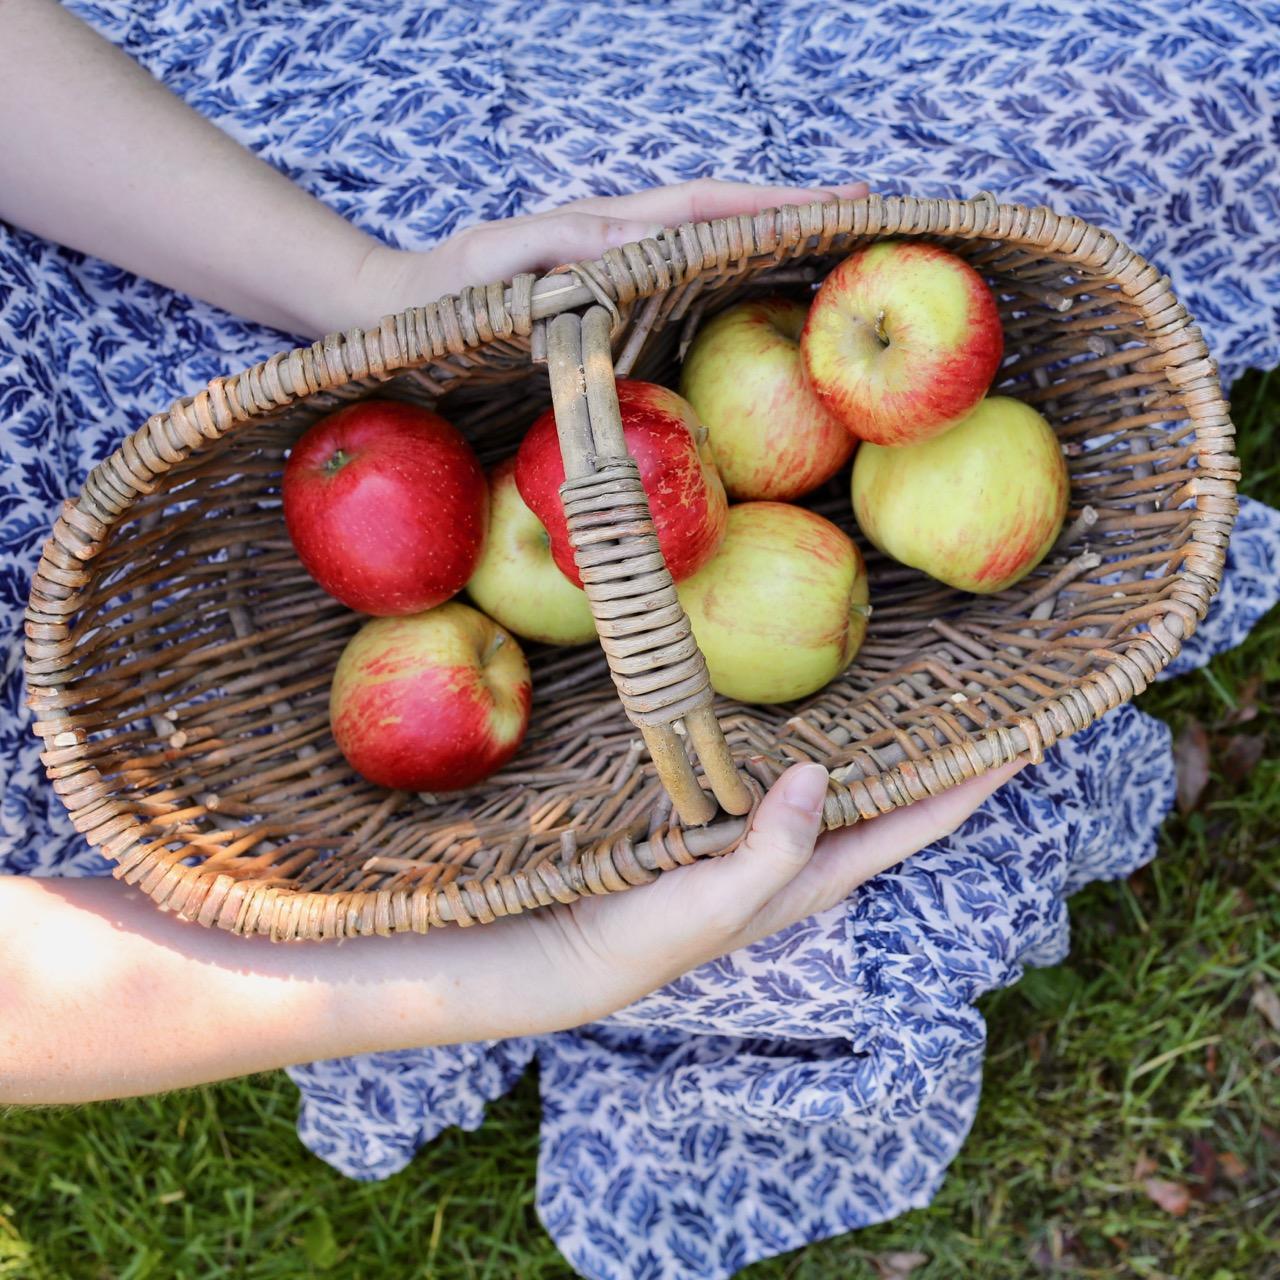 English apples